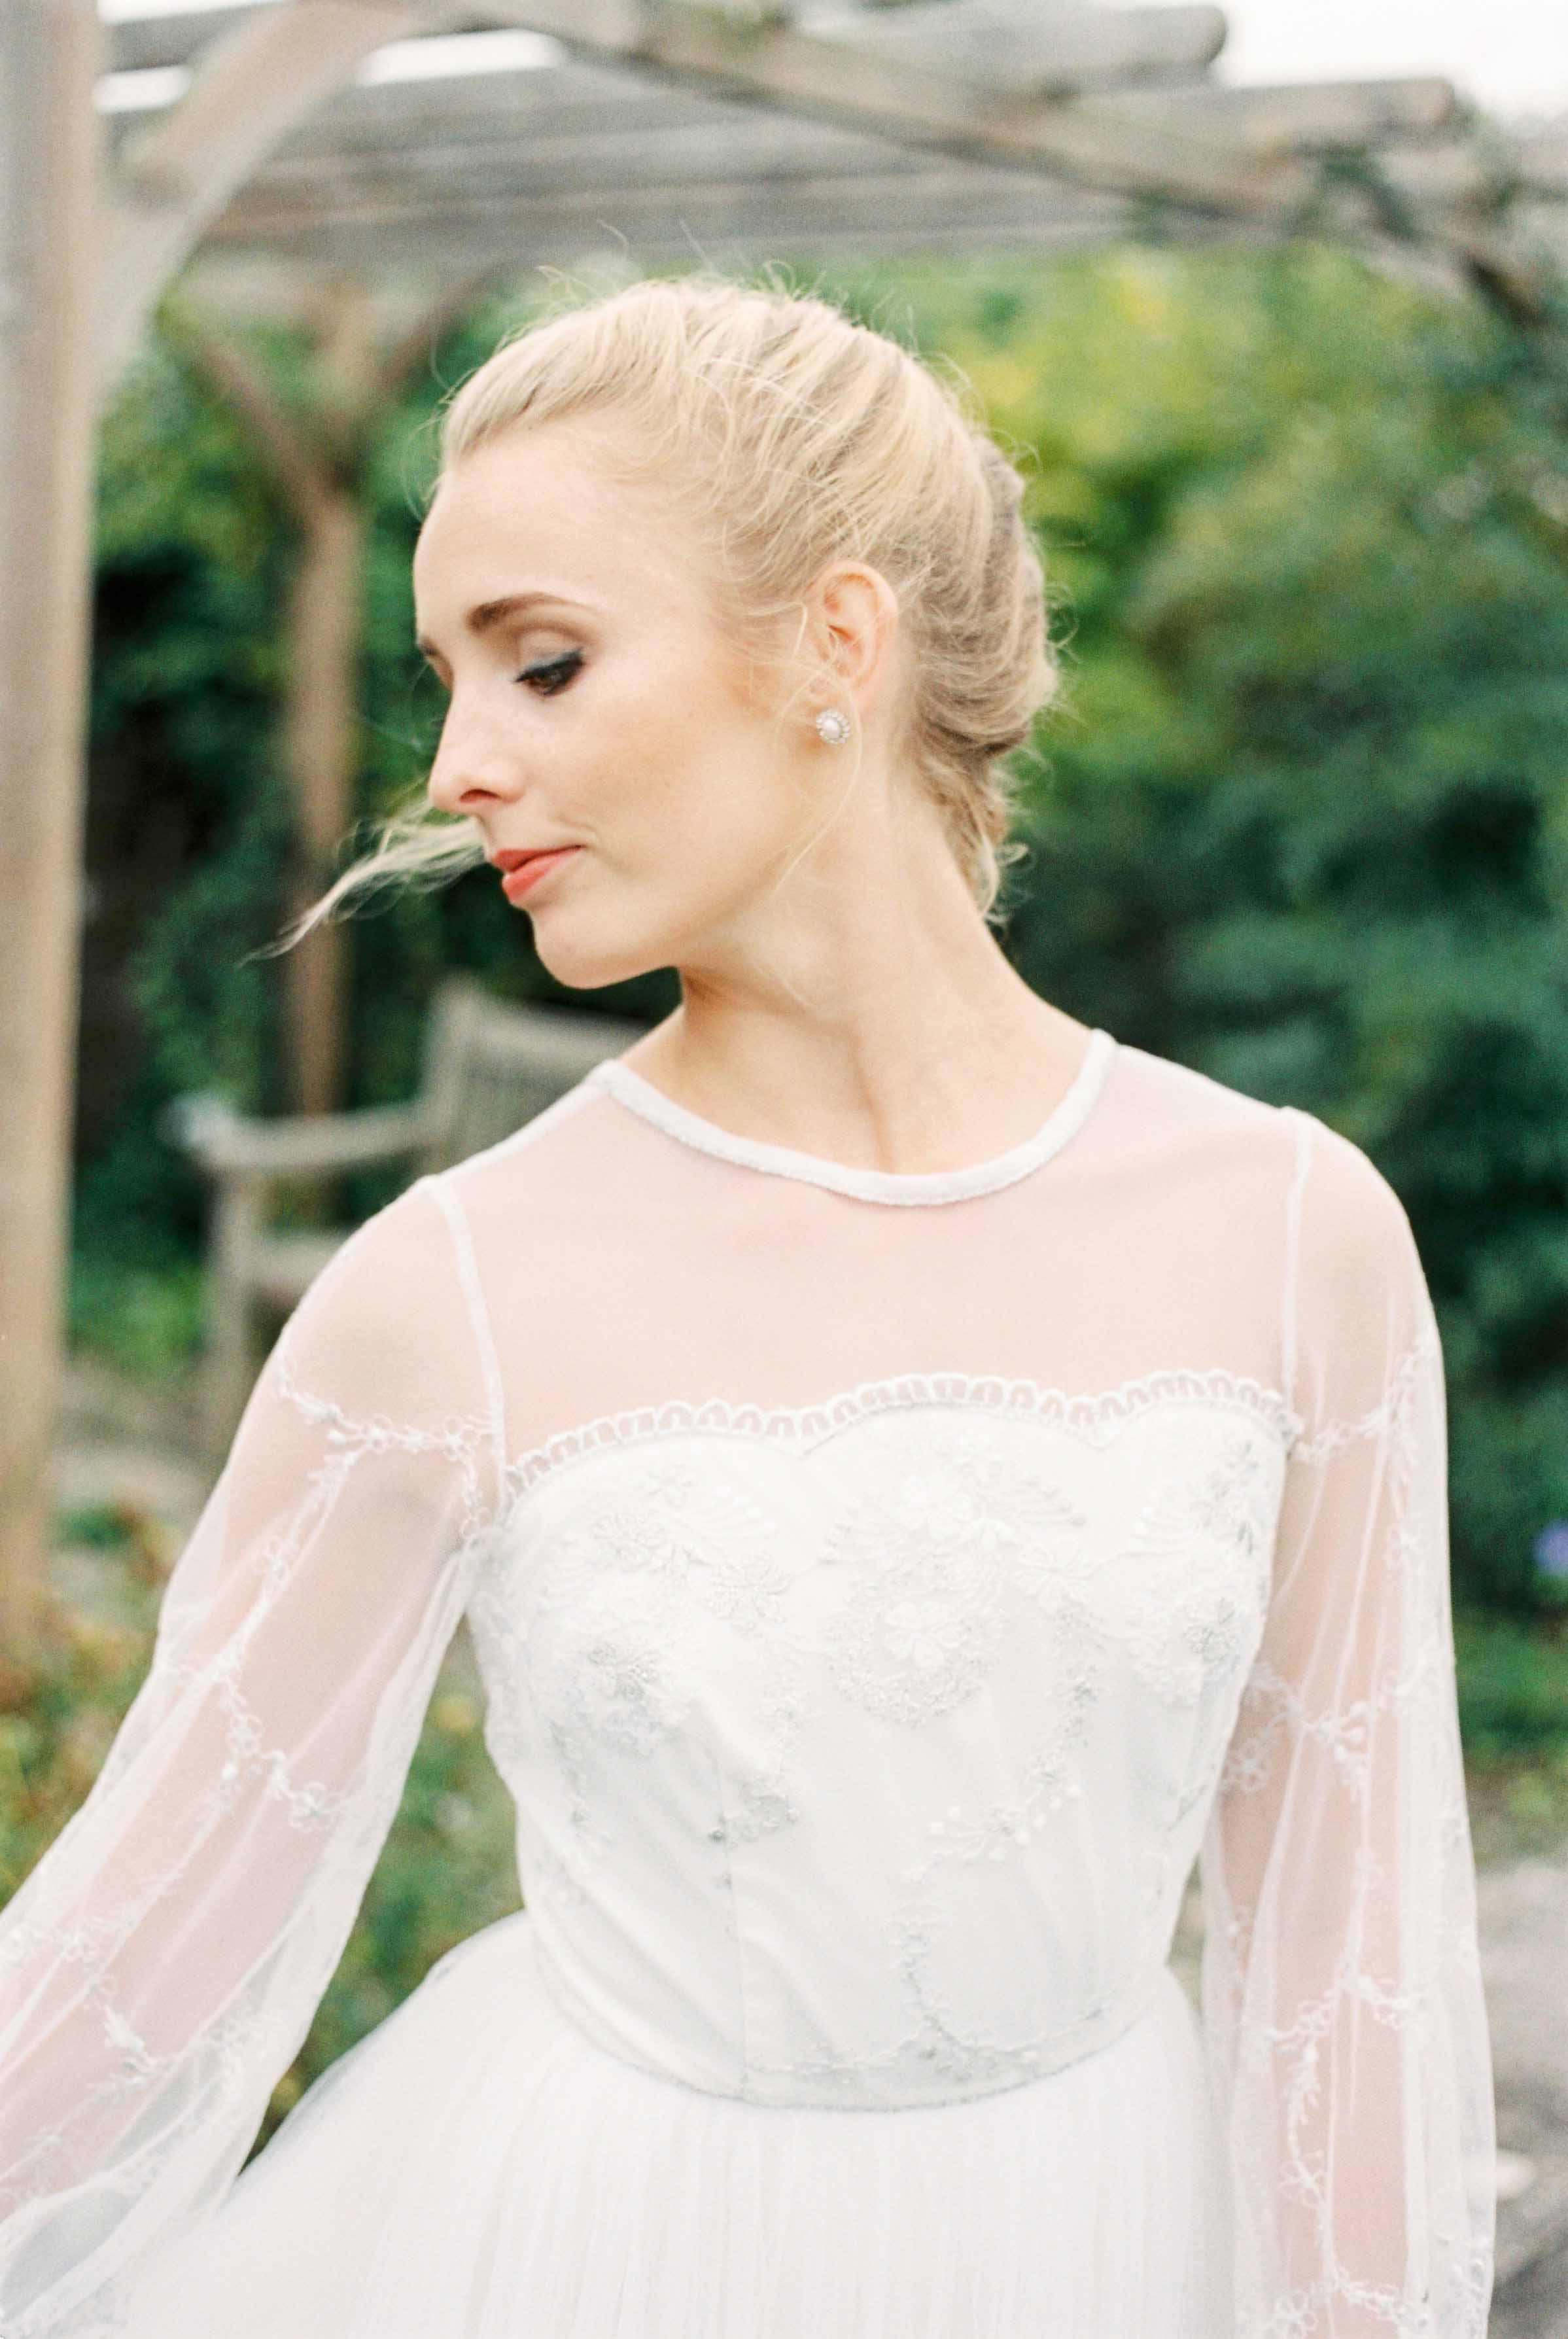 dorset-fine-art-wedding-photographer_amelia_carmencita_lores-1-of-24